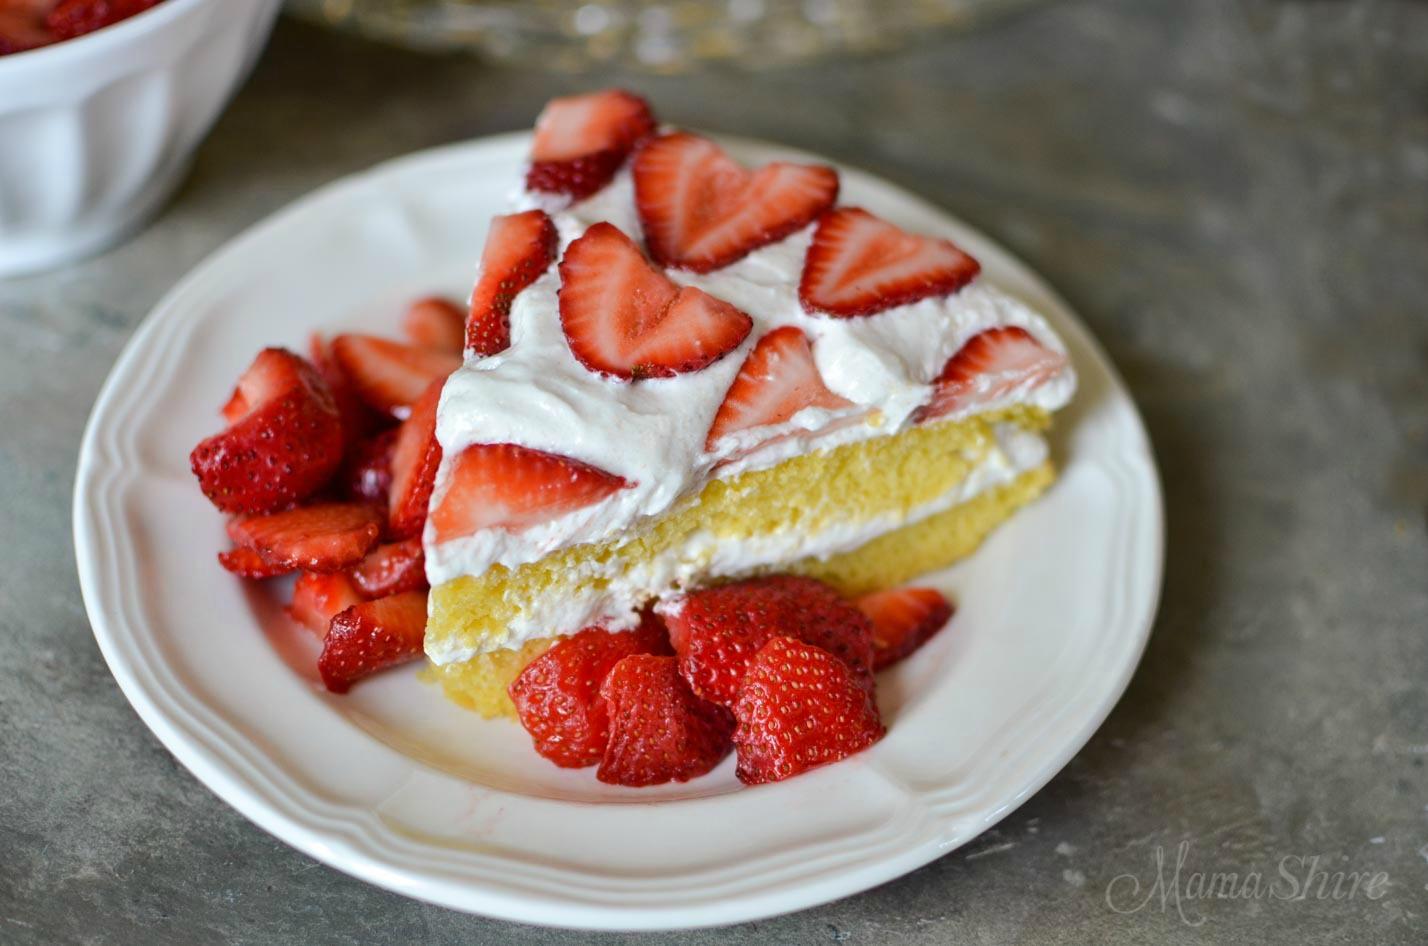 Grain Free And Dairy Free Strawberry Cake